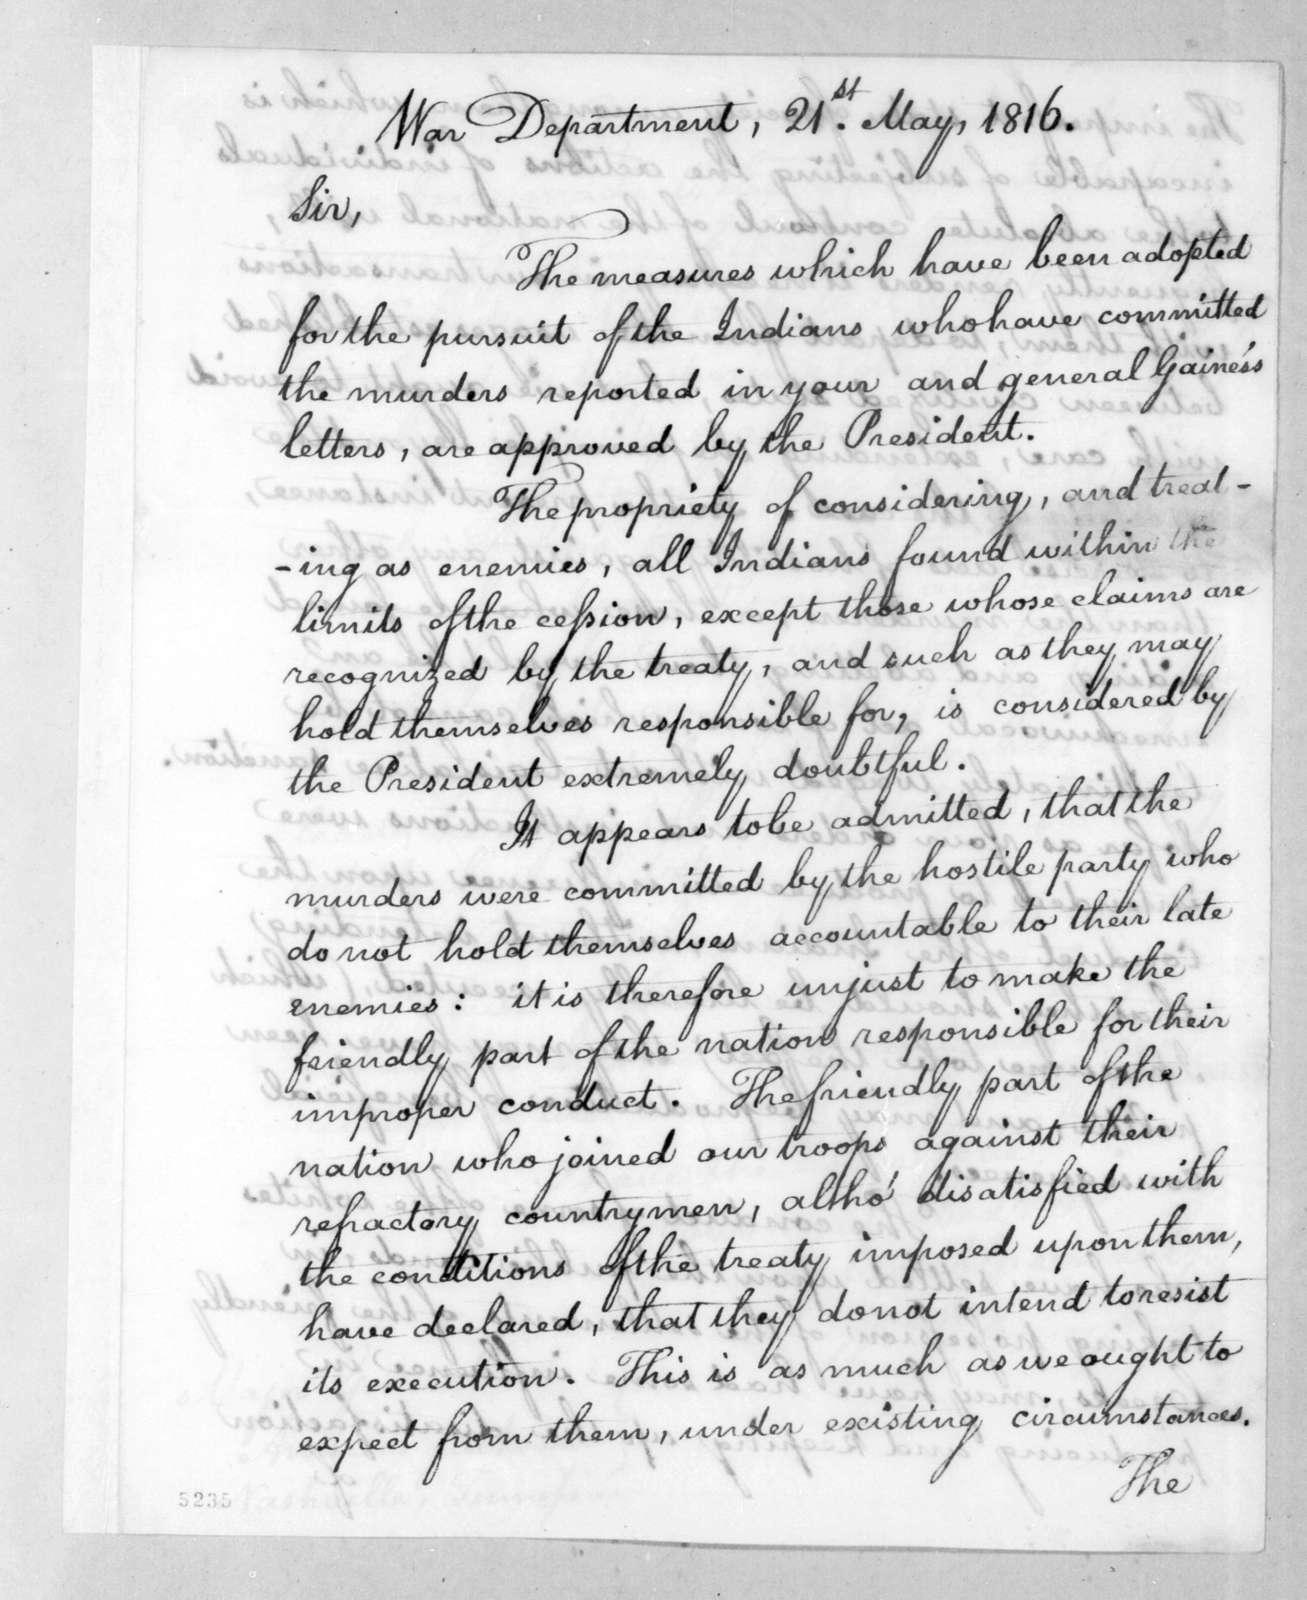 William Harris Crawford to Andrew Jackson, May 21, 1816